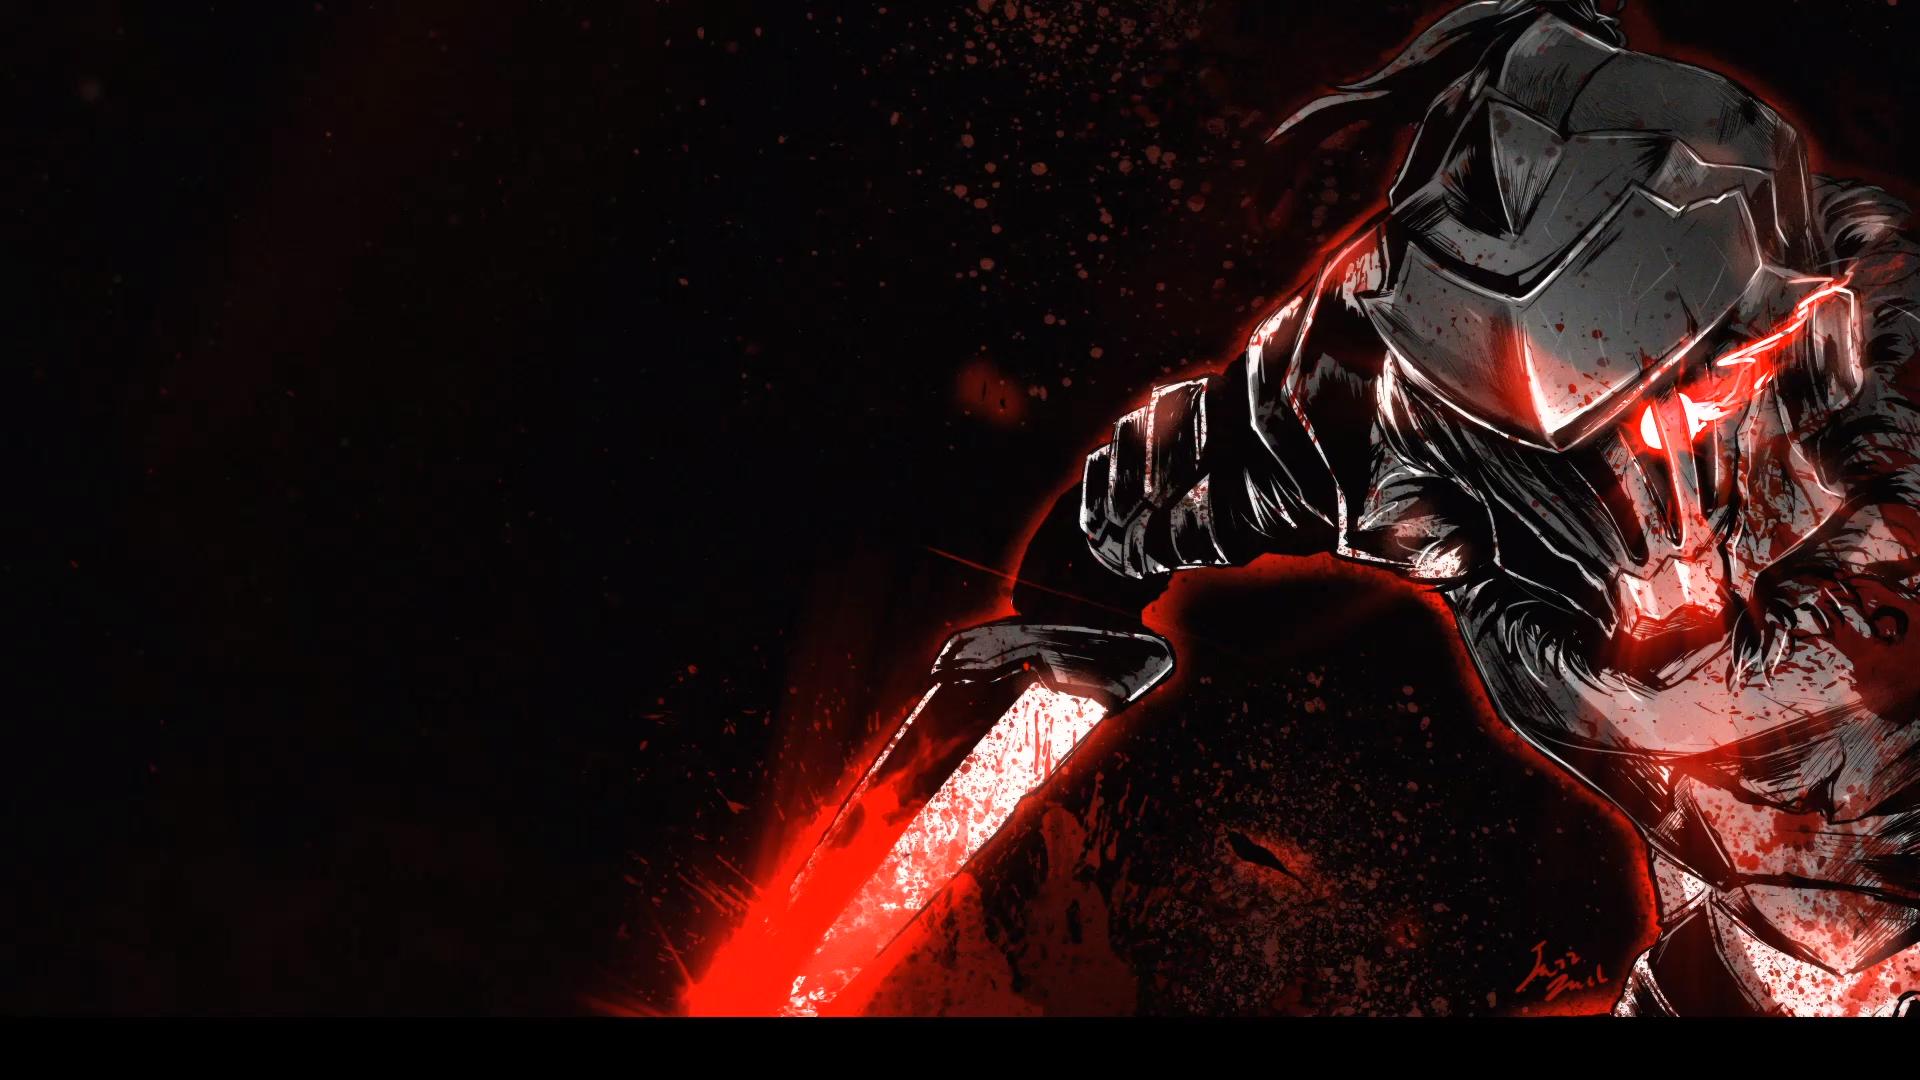 Video Video Wallpaper Seni Anime Mengagumkan Seni